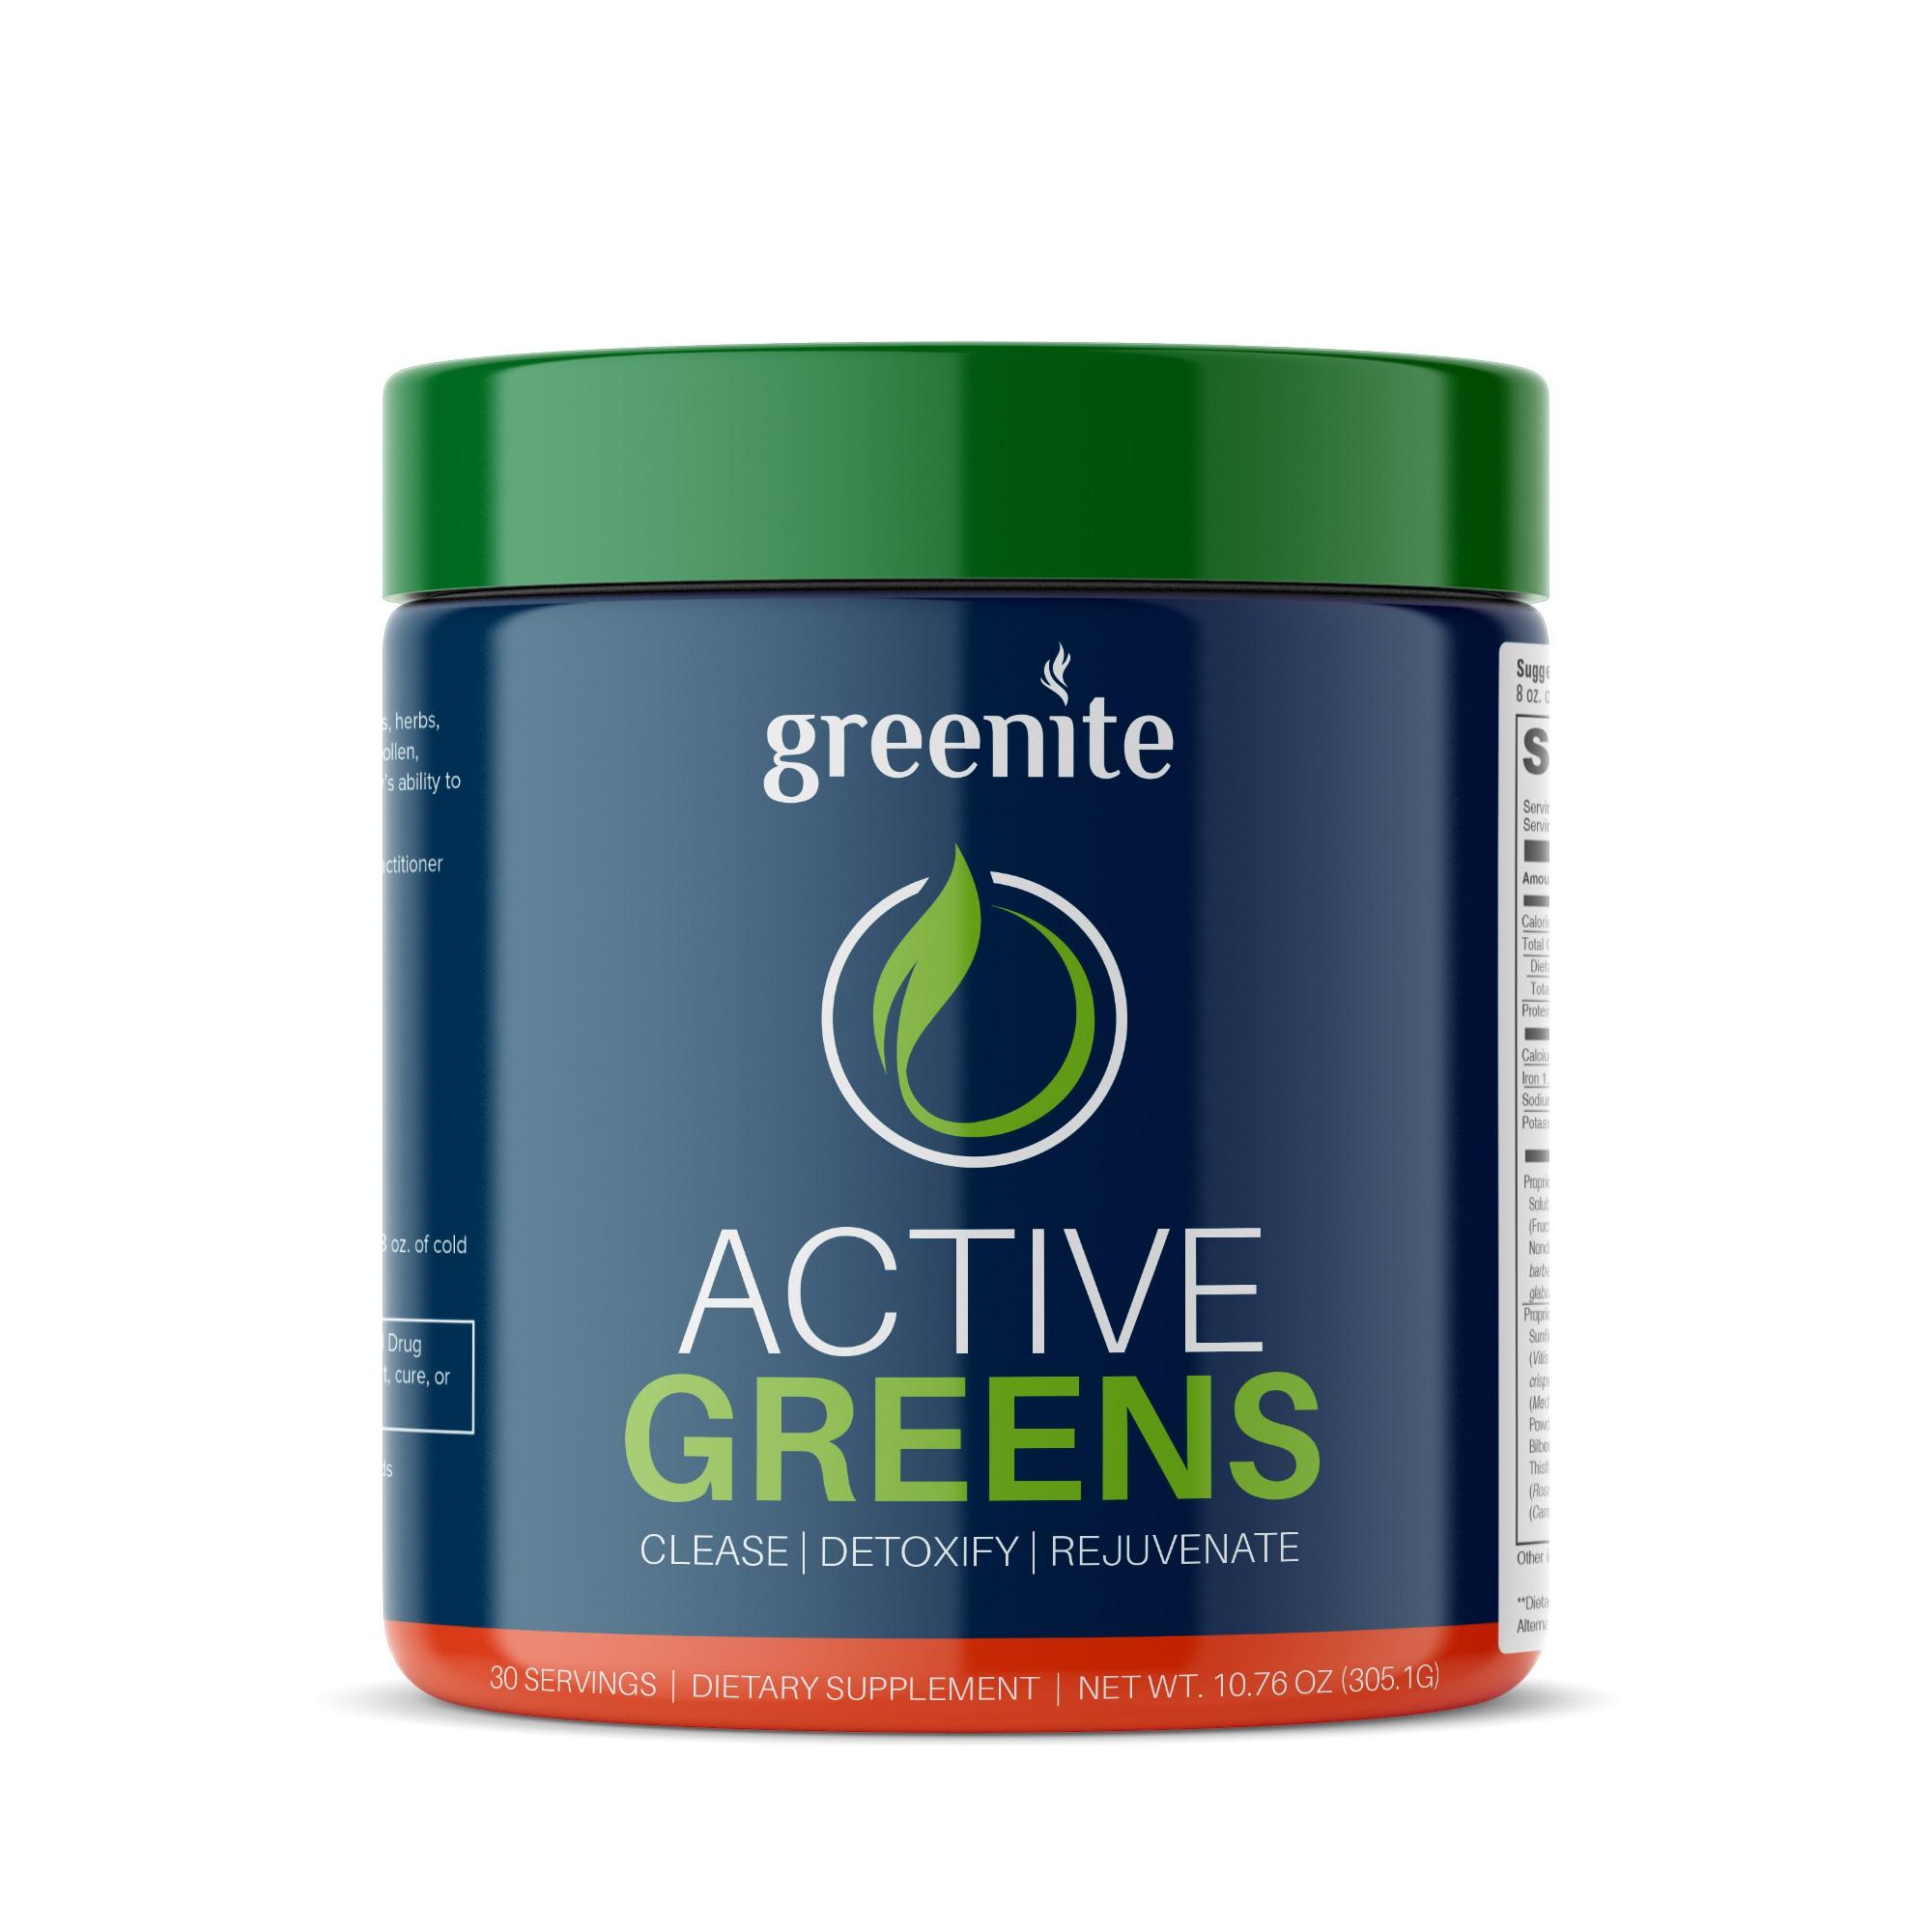 Change the center of the label Greenite.